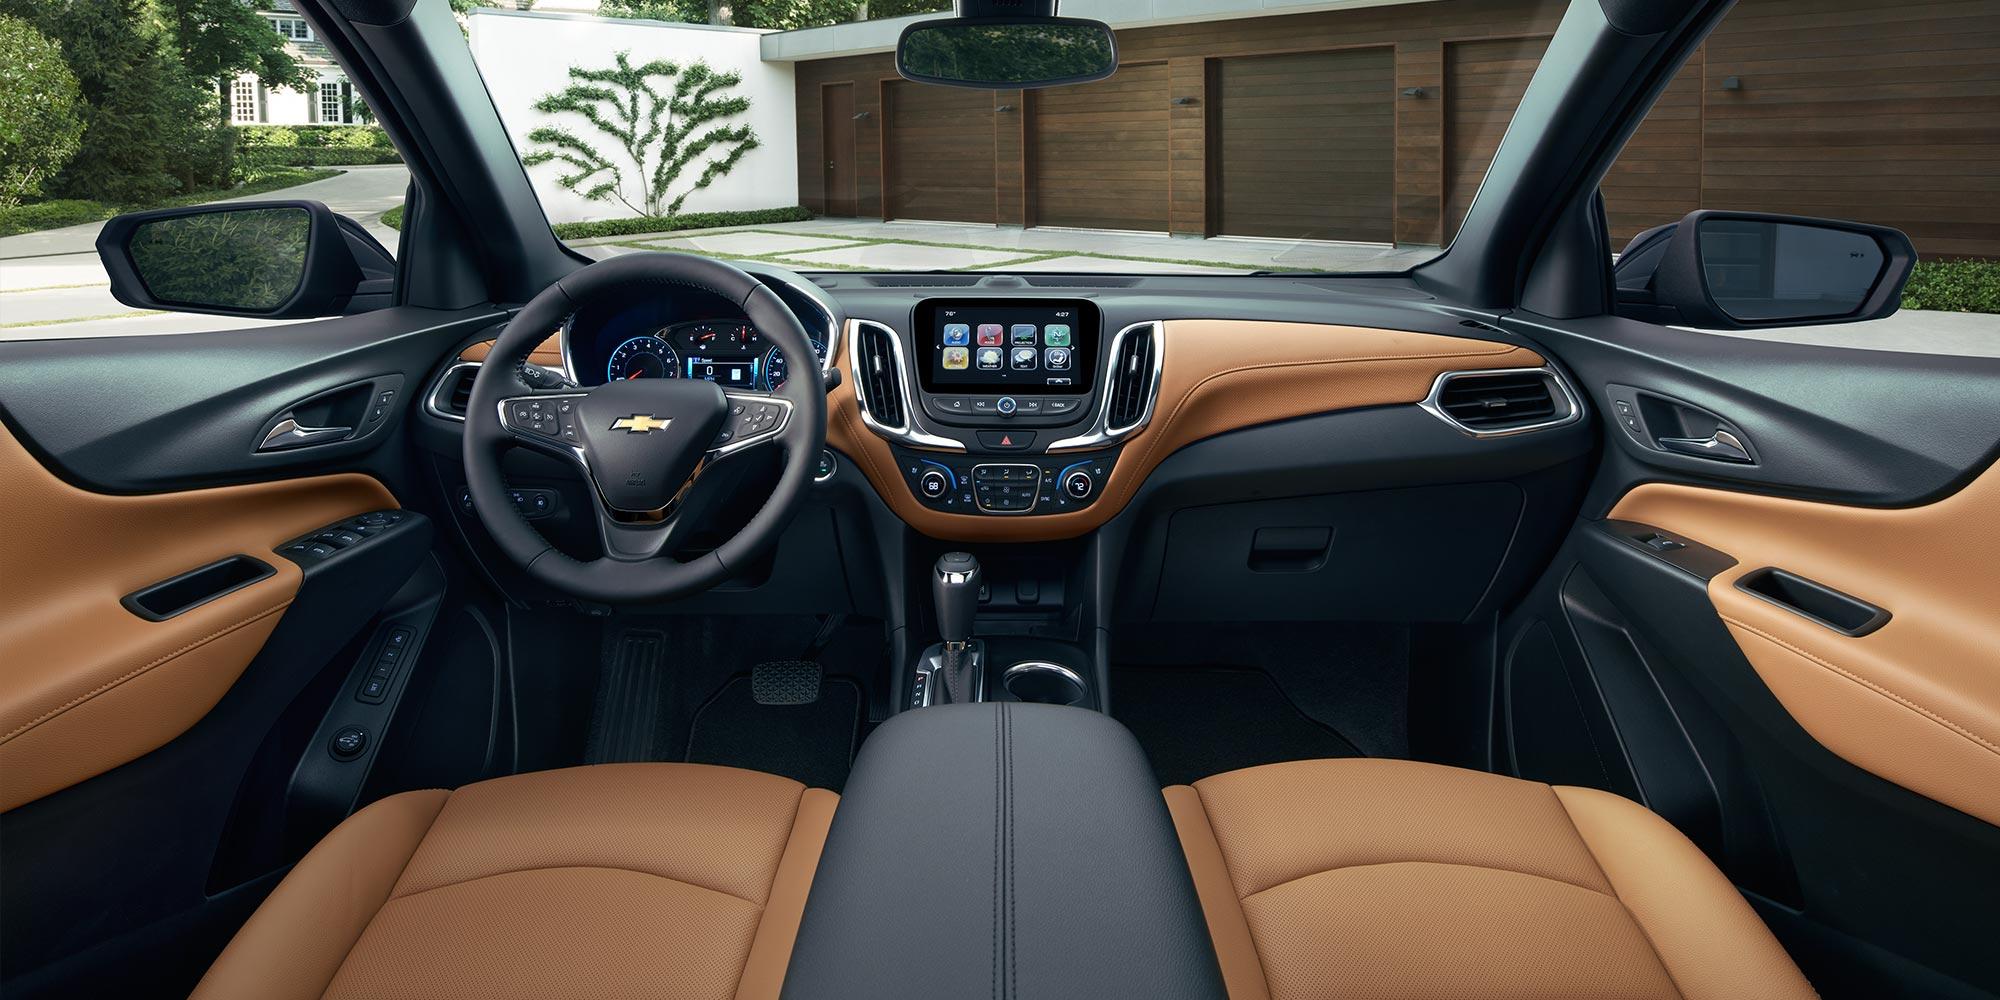 hight resolution of new chevrolet equinox interior features